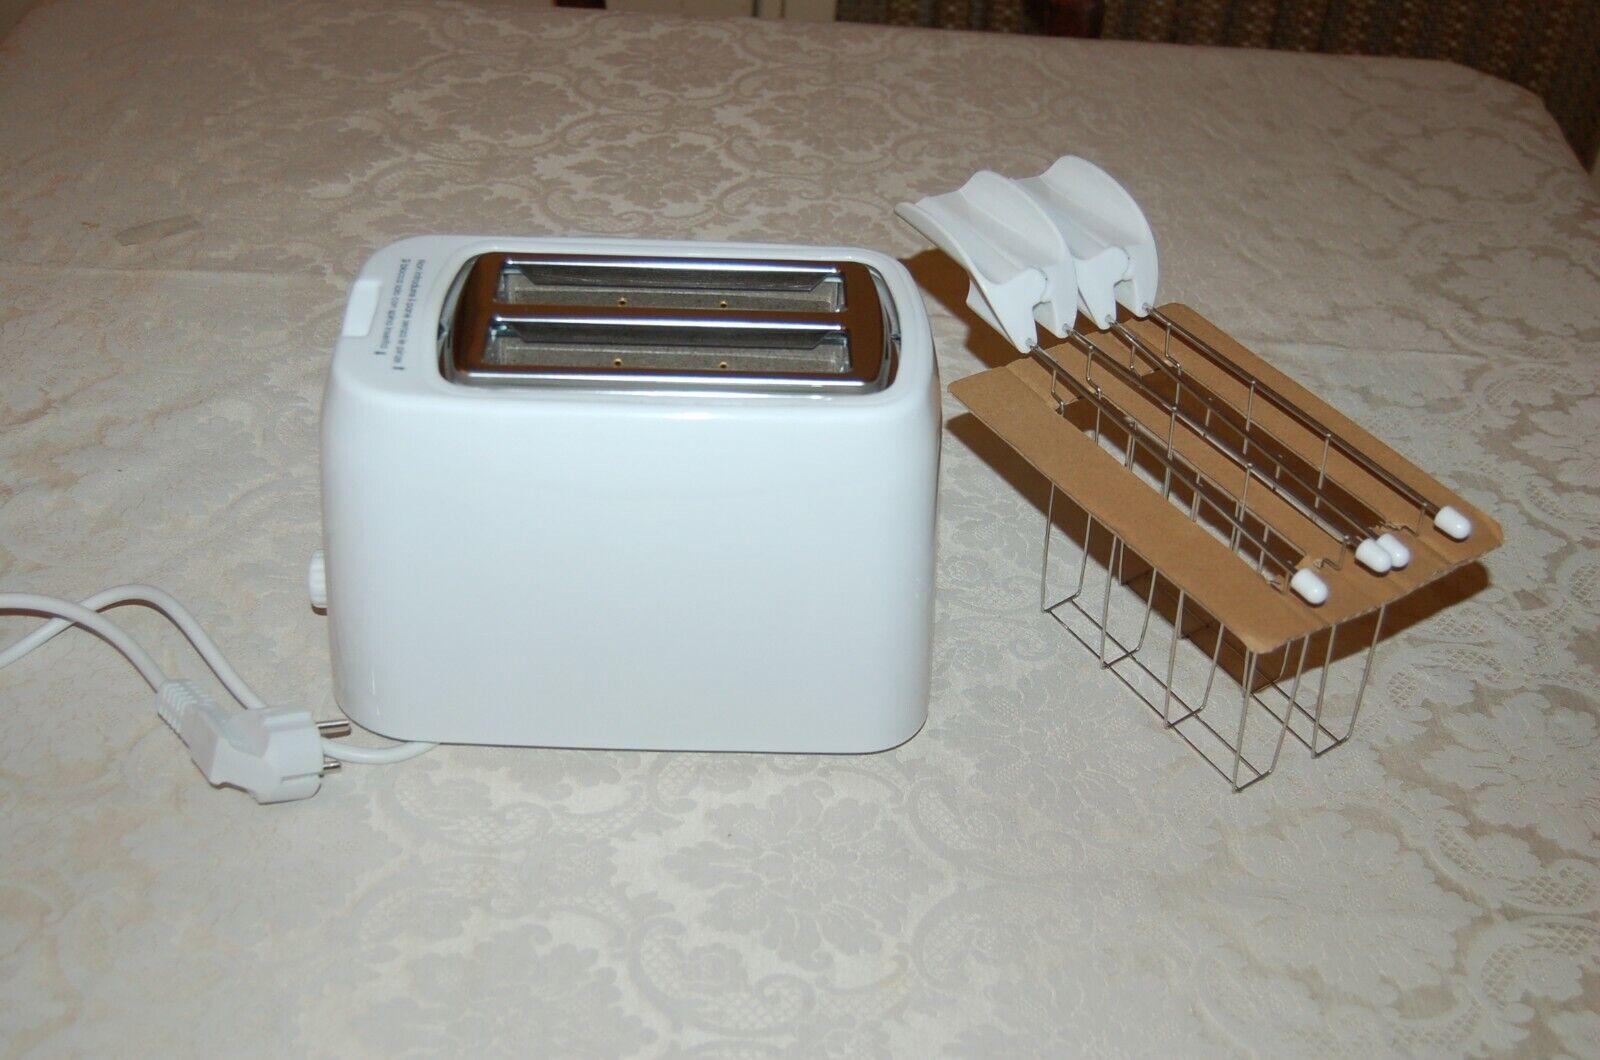 Tostapane, Bianco, Due Pinze, Mai usato